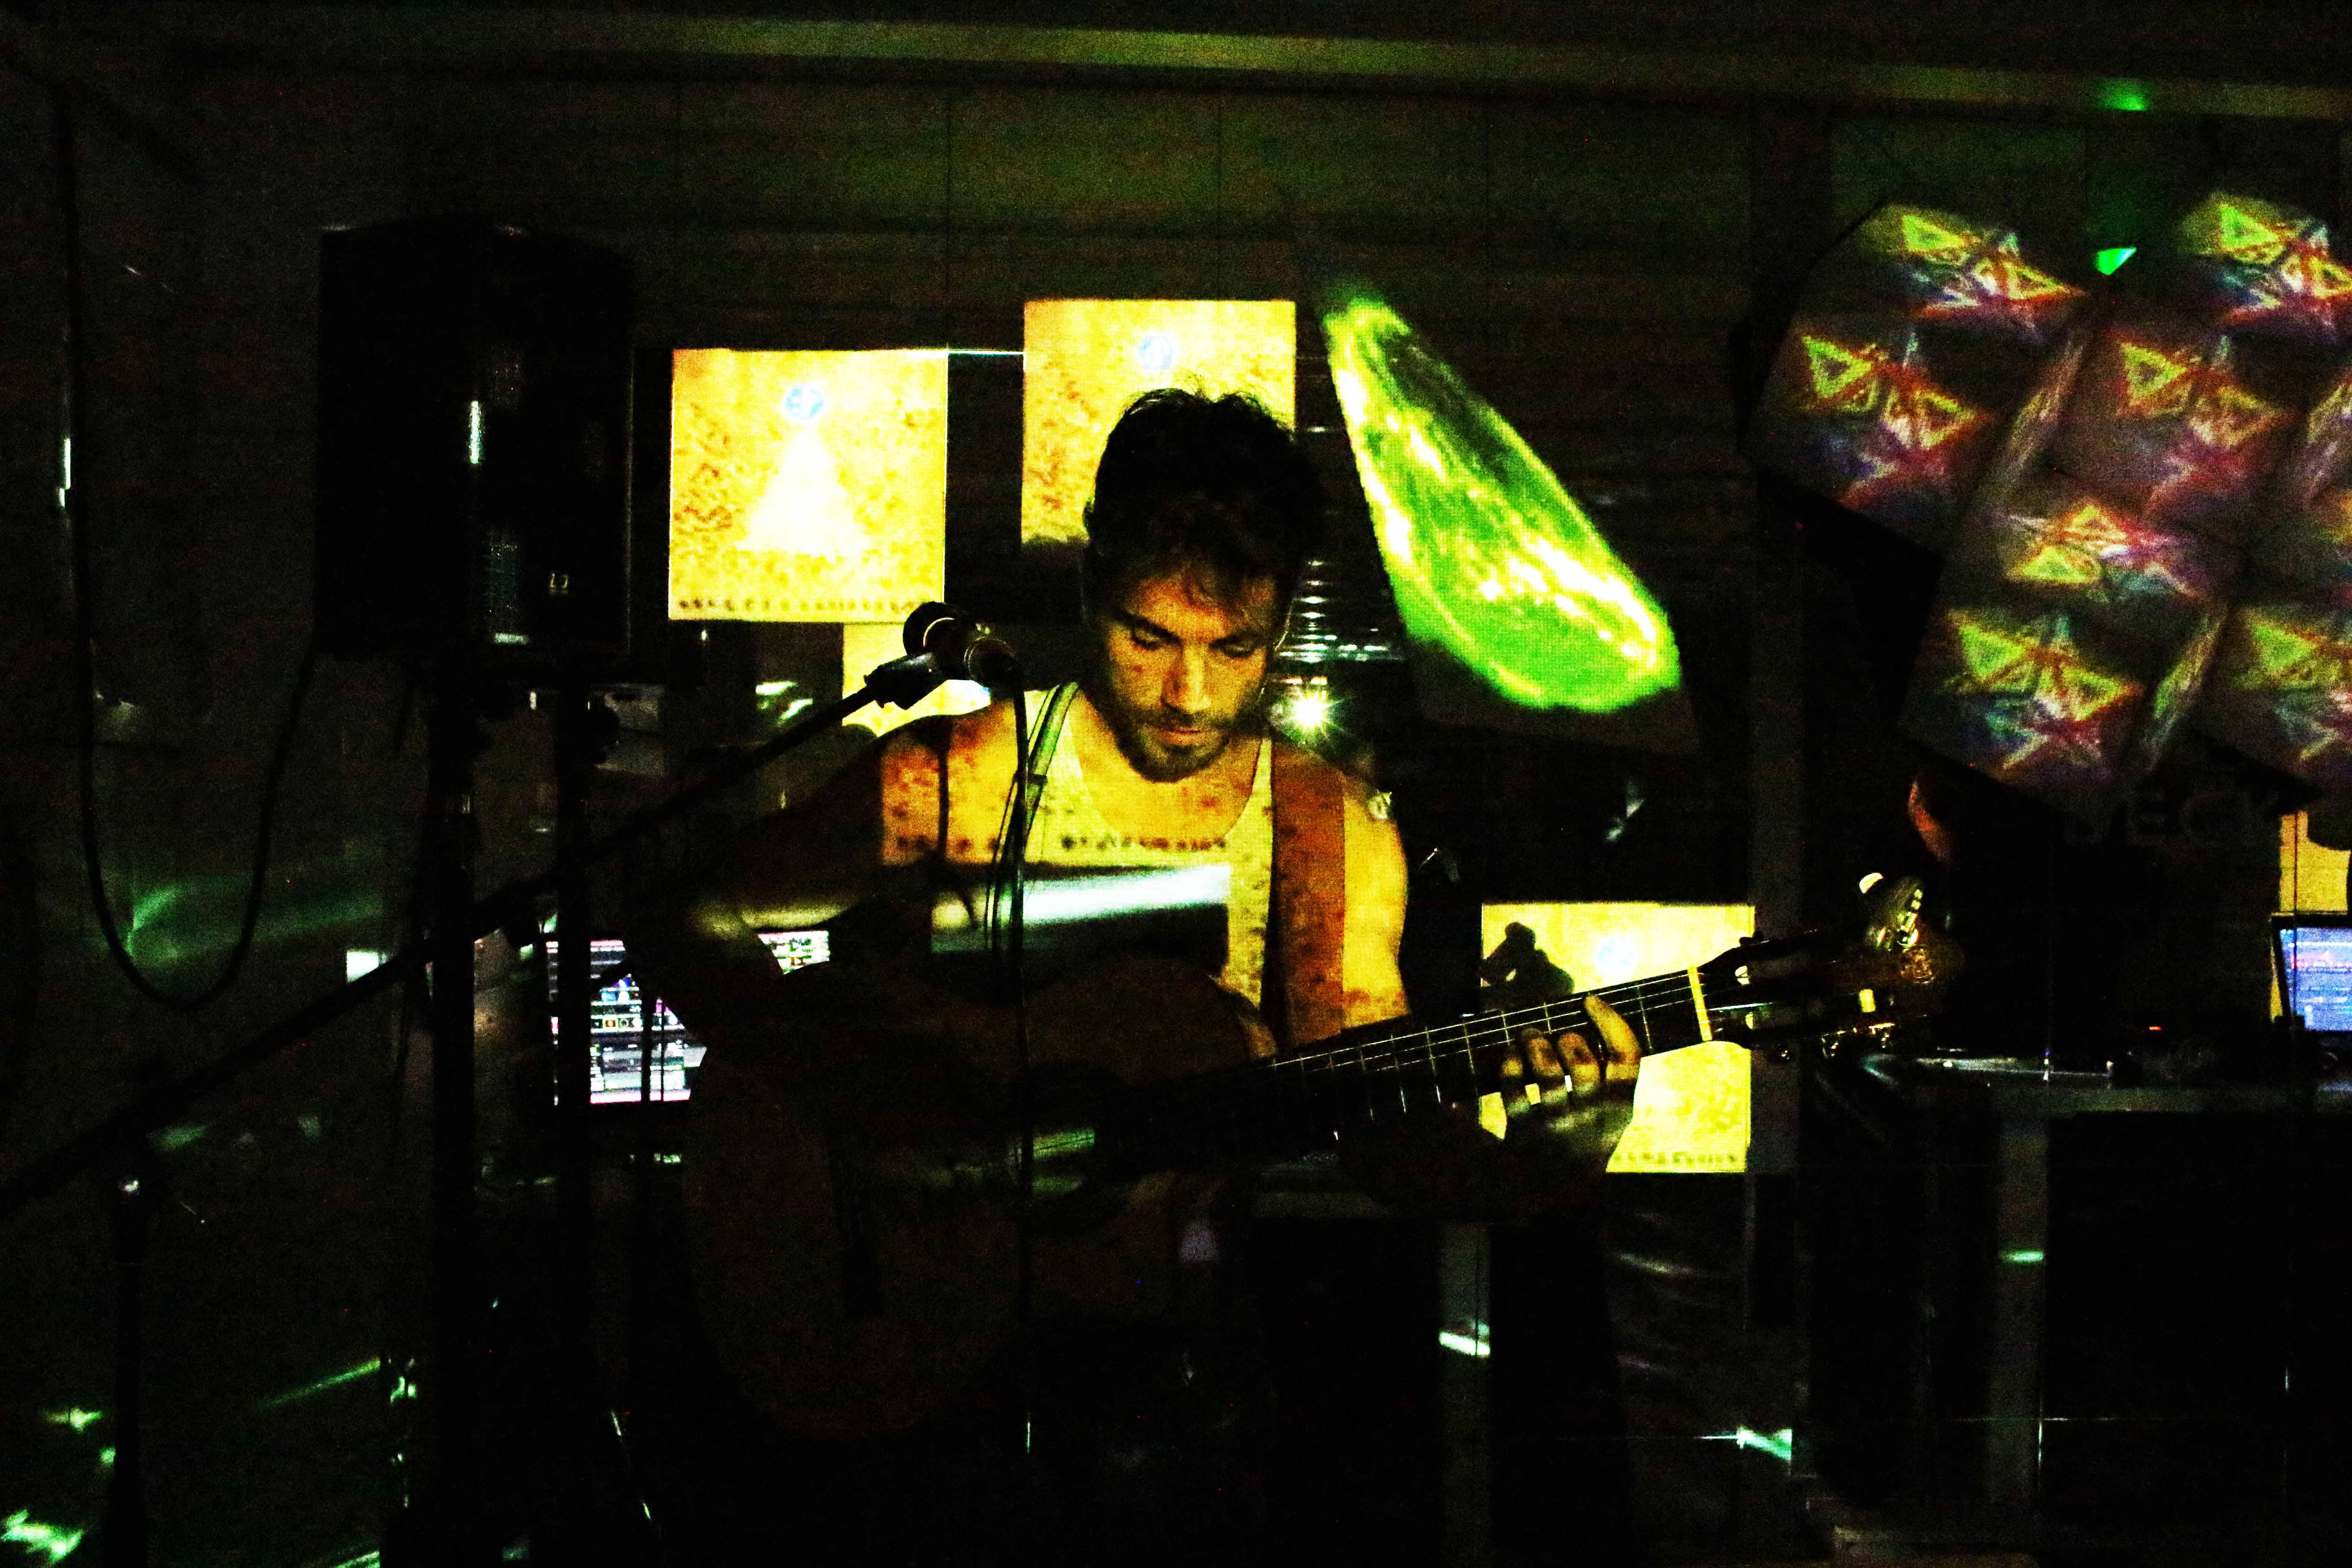 ¡¡NEW Pablo J live vids online!!